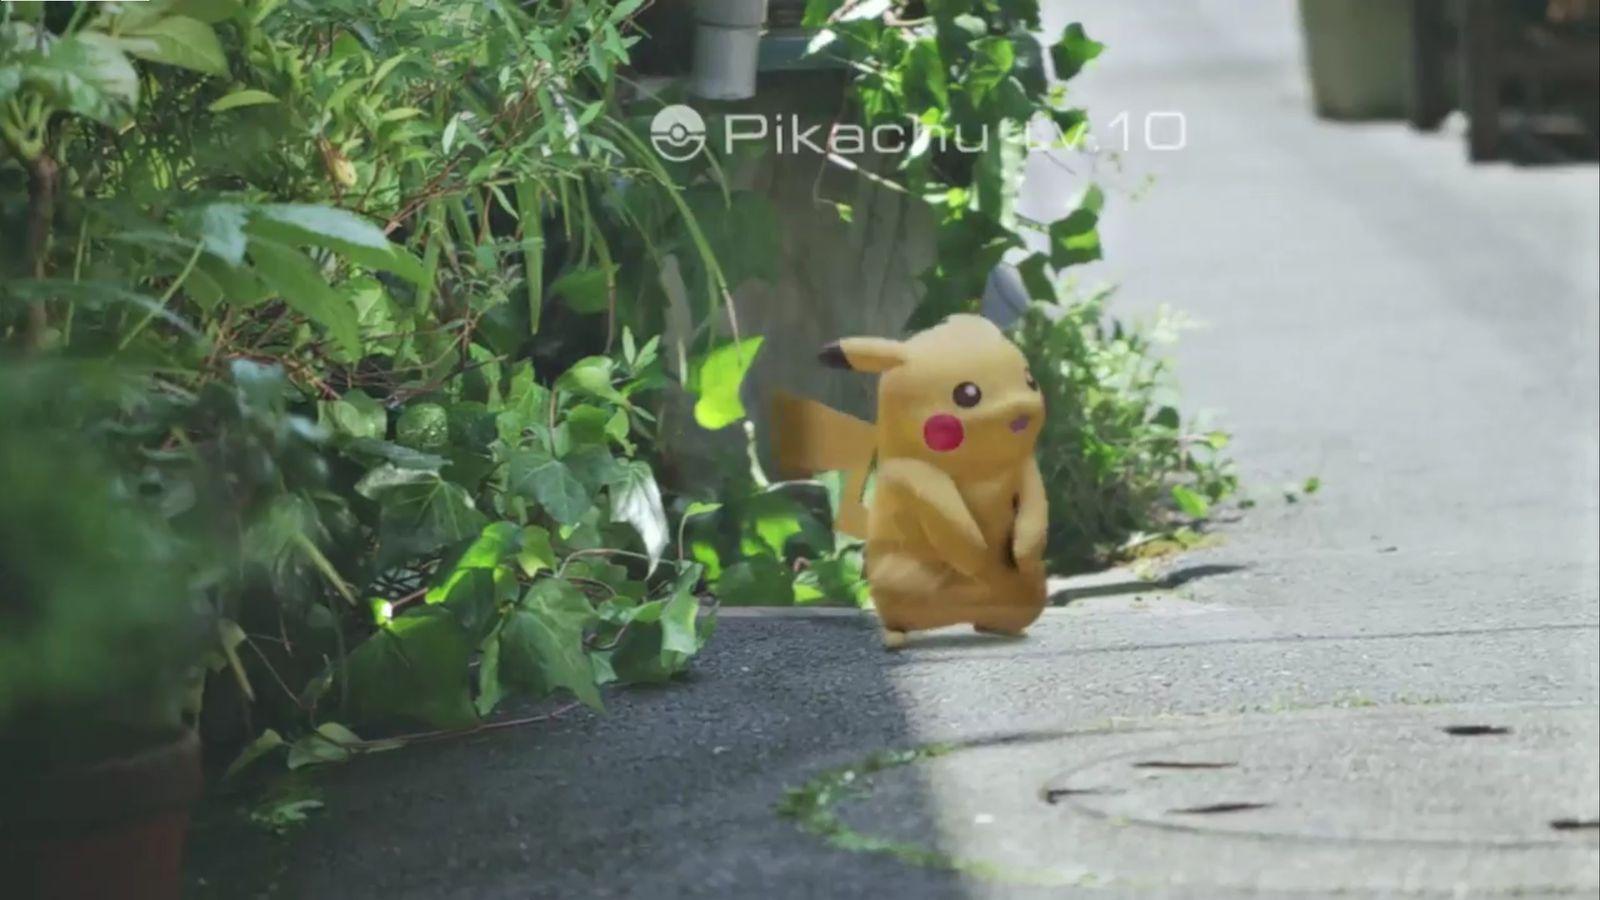 NUR ALS ZITAT Screenshot Pokemon Go